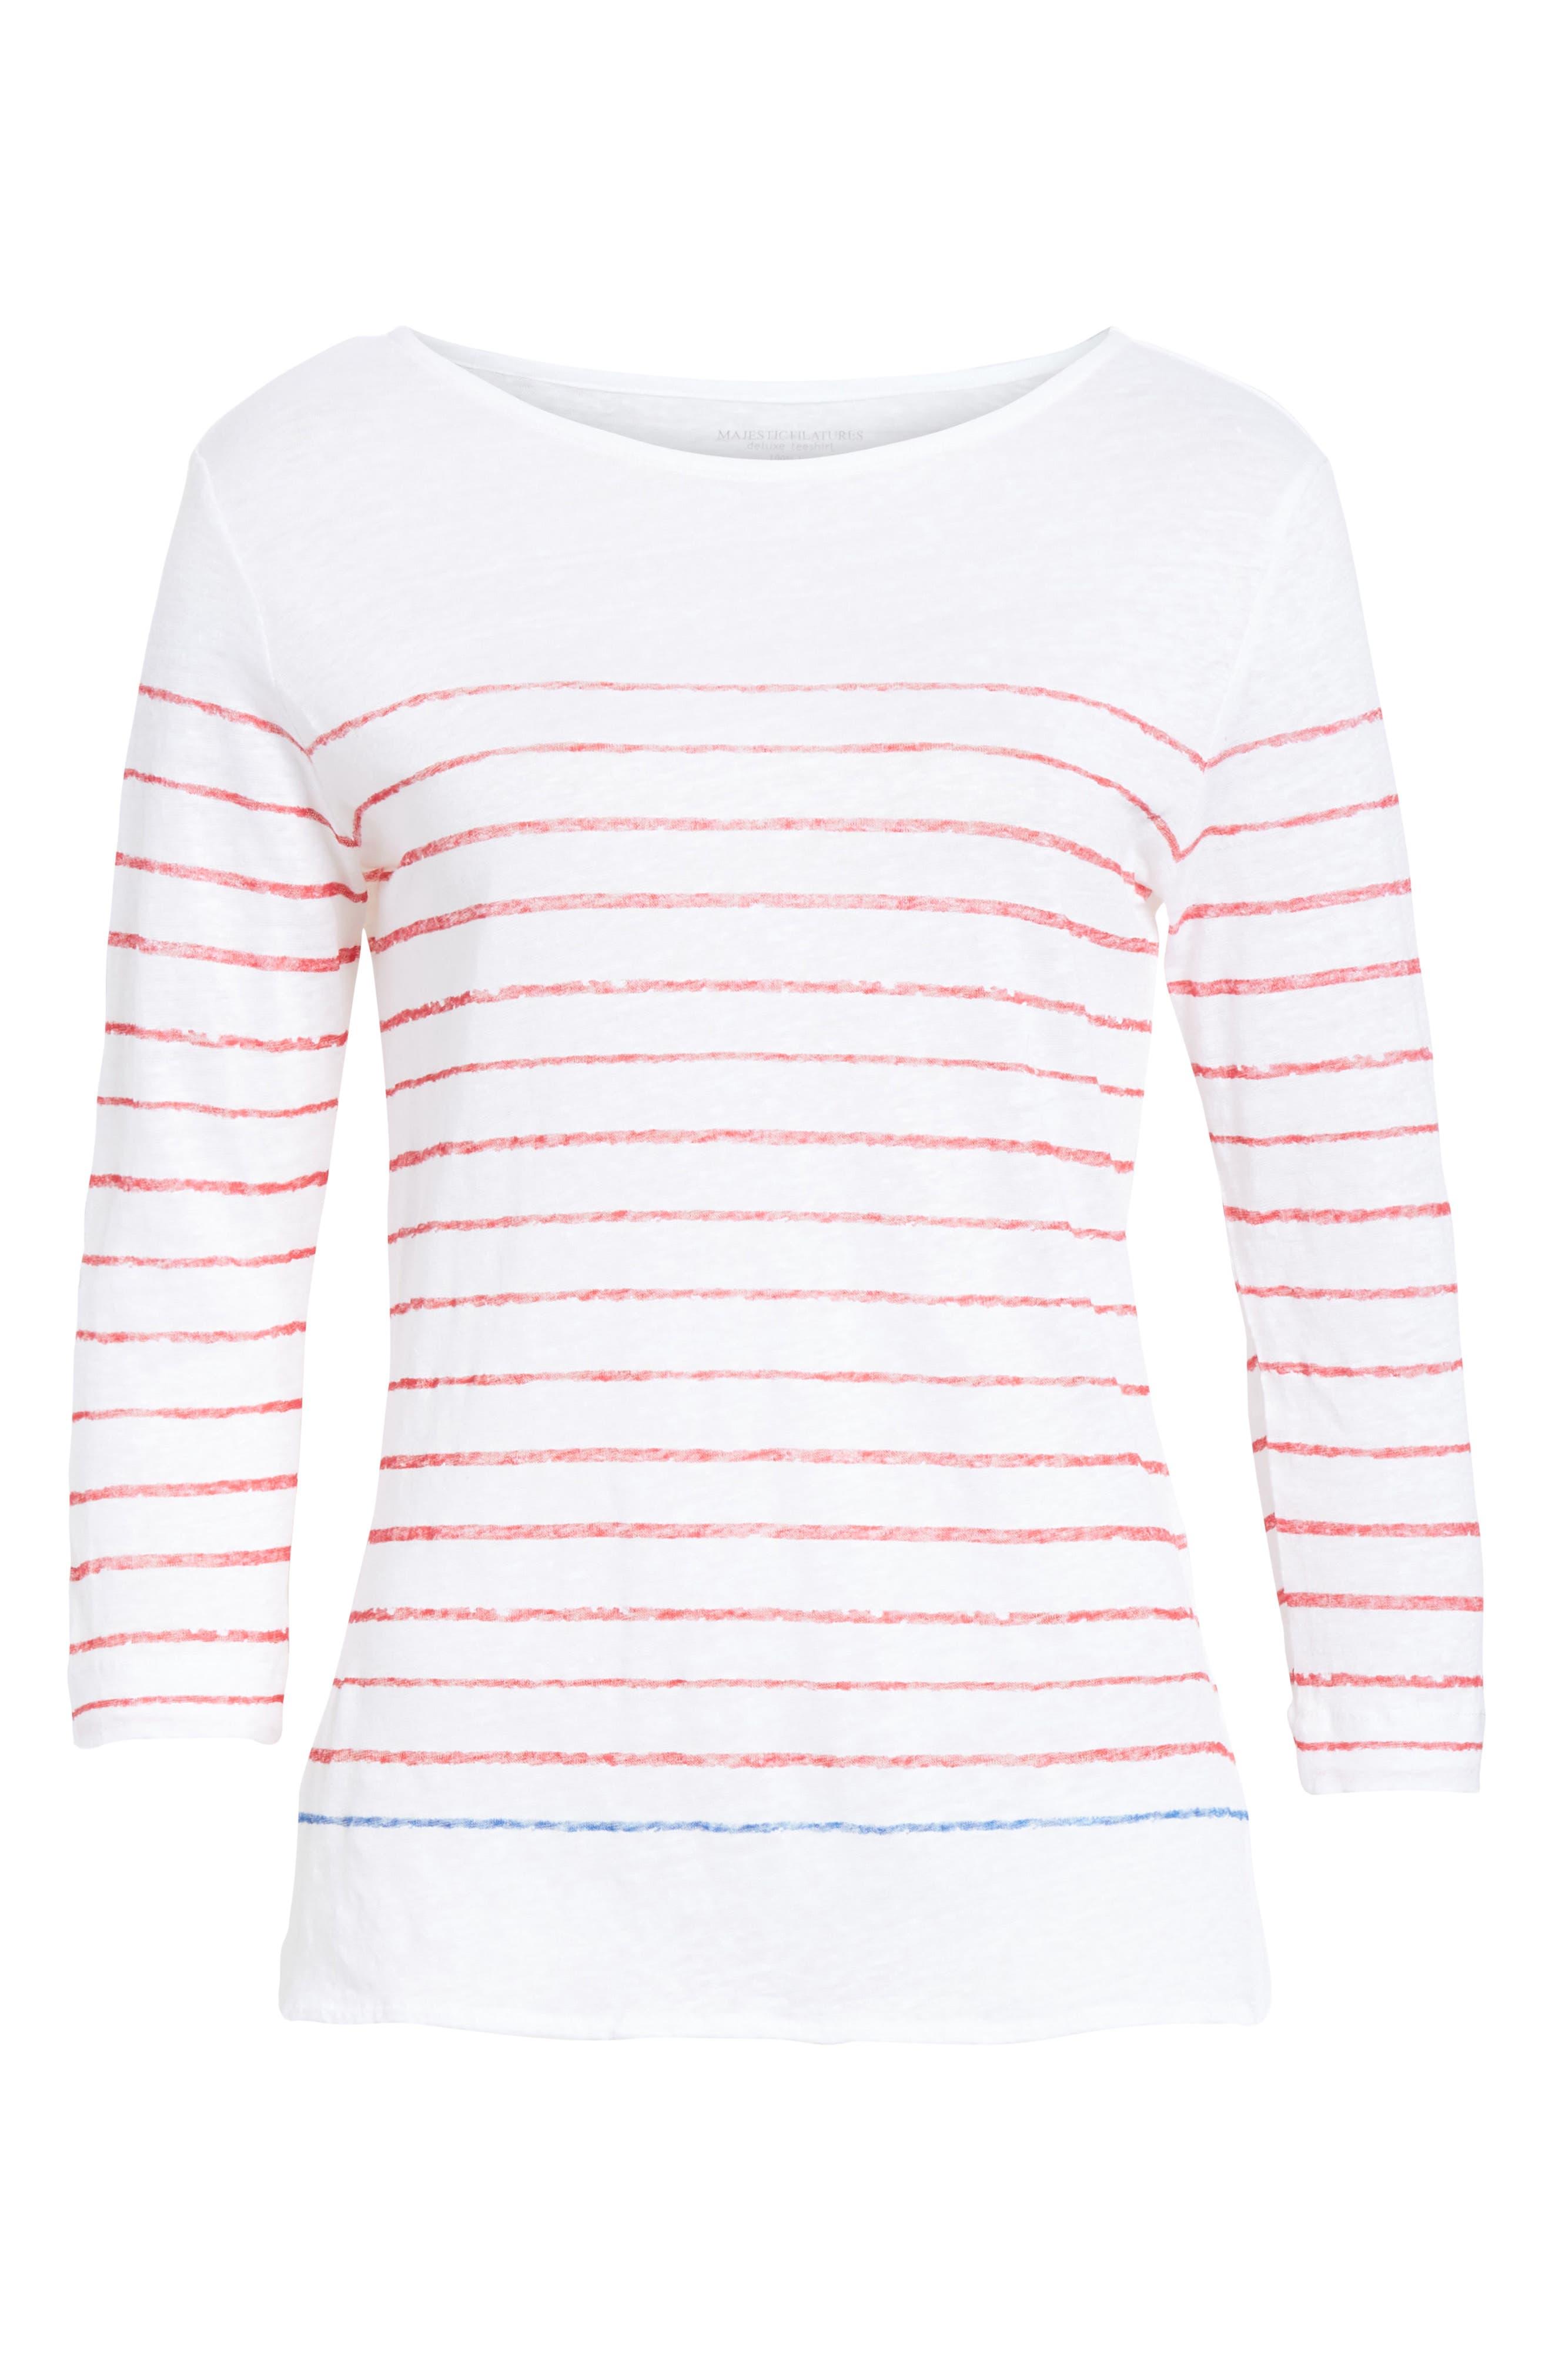 Stripe Three Quarter Sleeve Tee,                             Alternate thumbnail 6, color,                             Rouge/ Indigo Blue